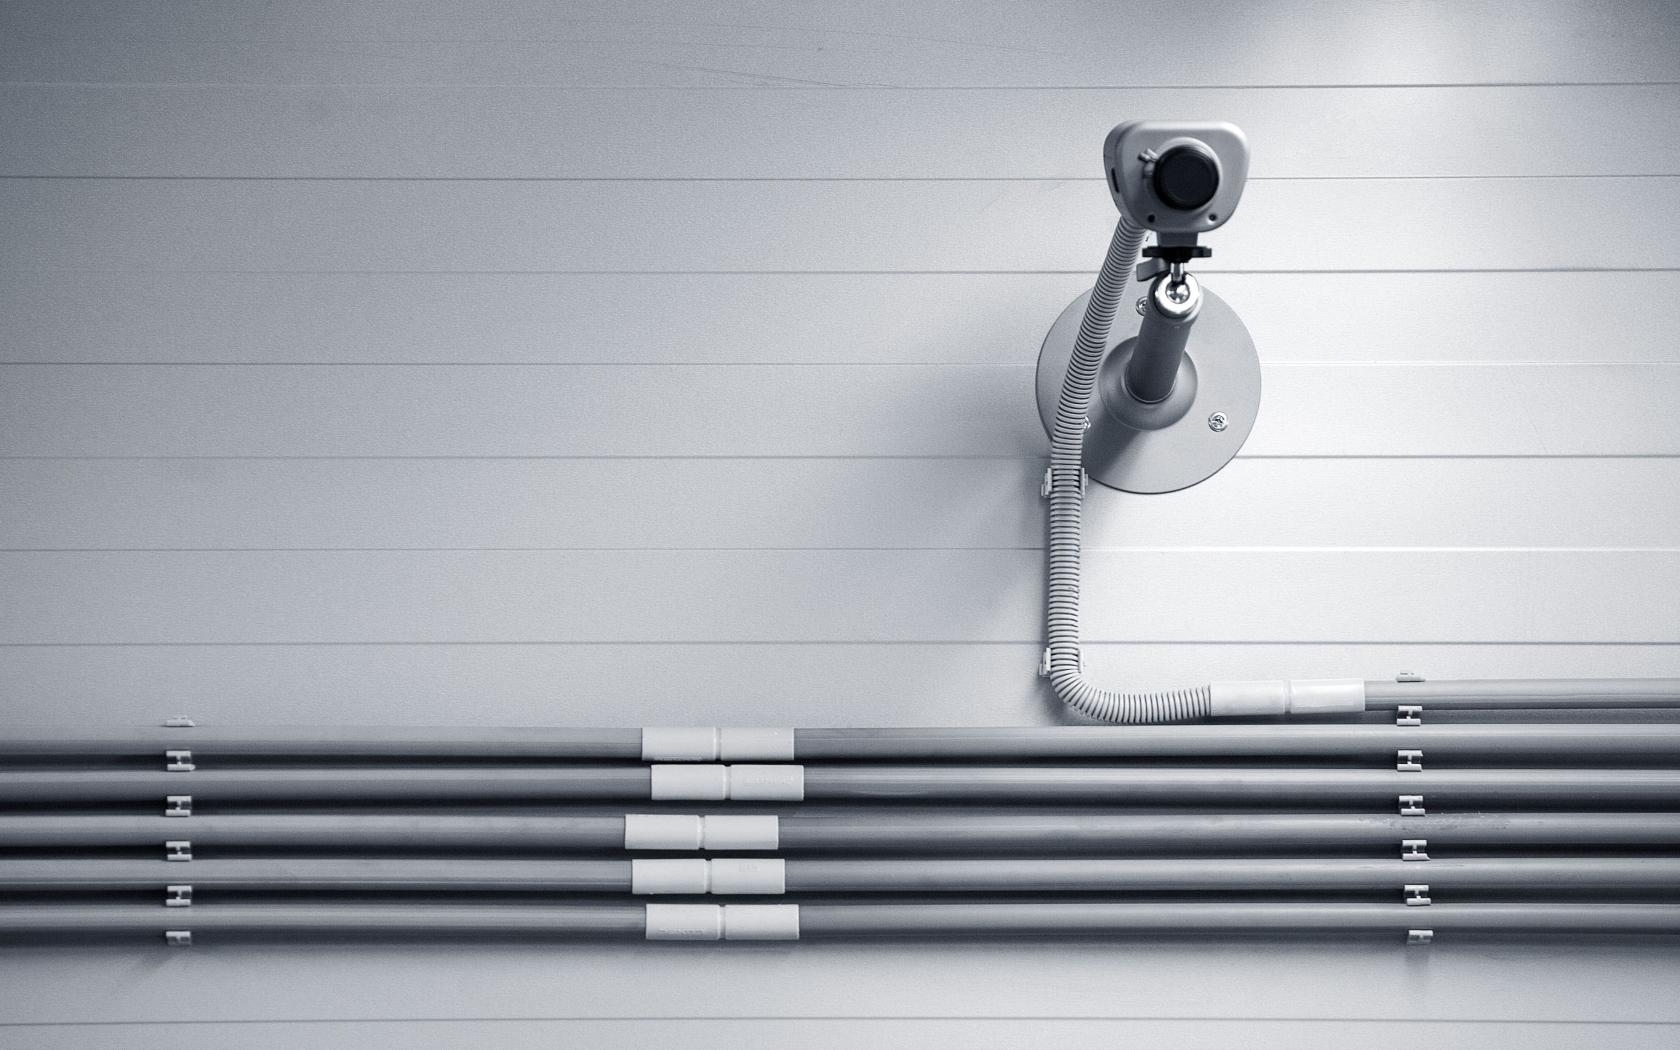 Download Surveillance Wallpaper 1680x1050 Wallpoper 375674 1680x1050